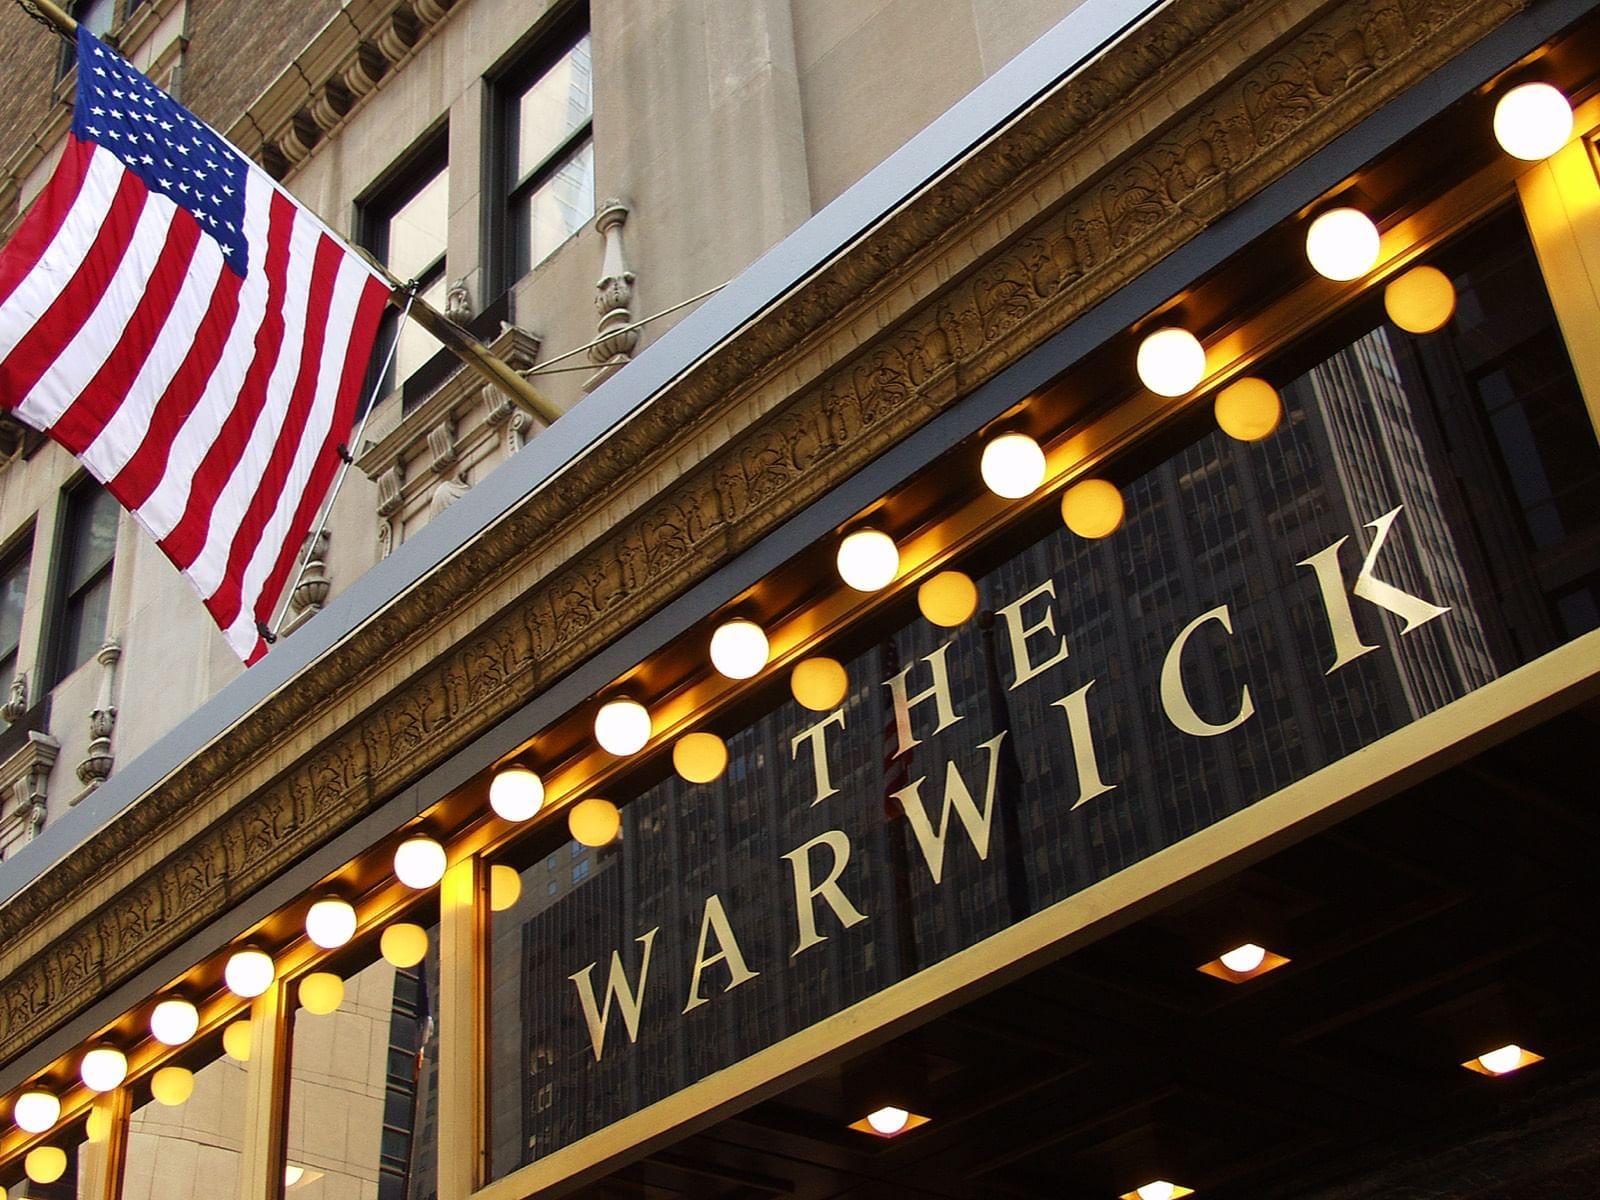 Entrée au Warwick New York